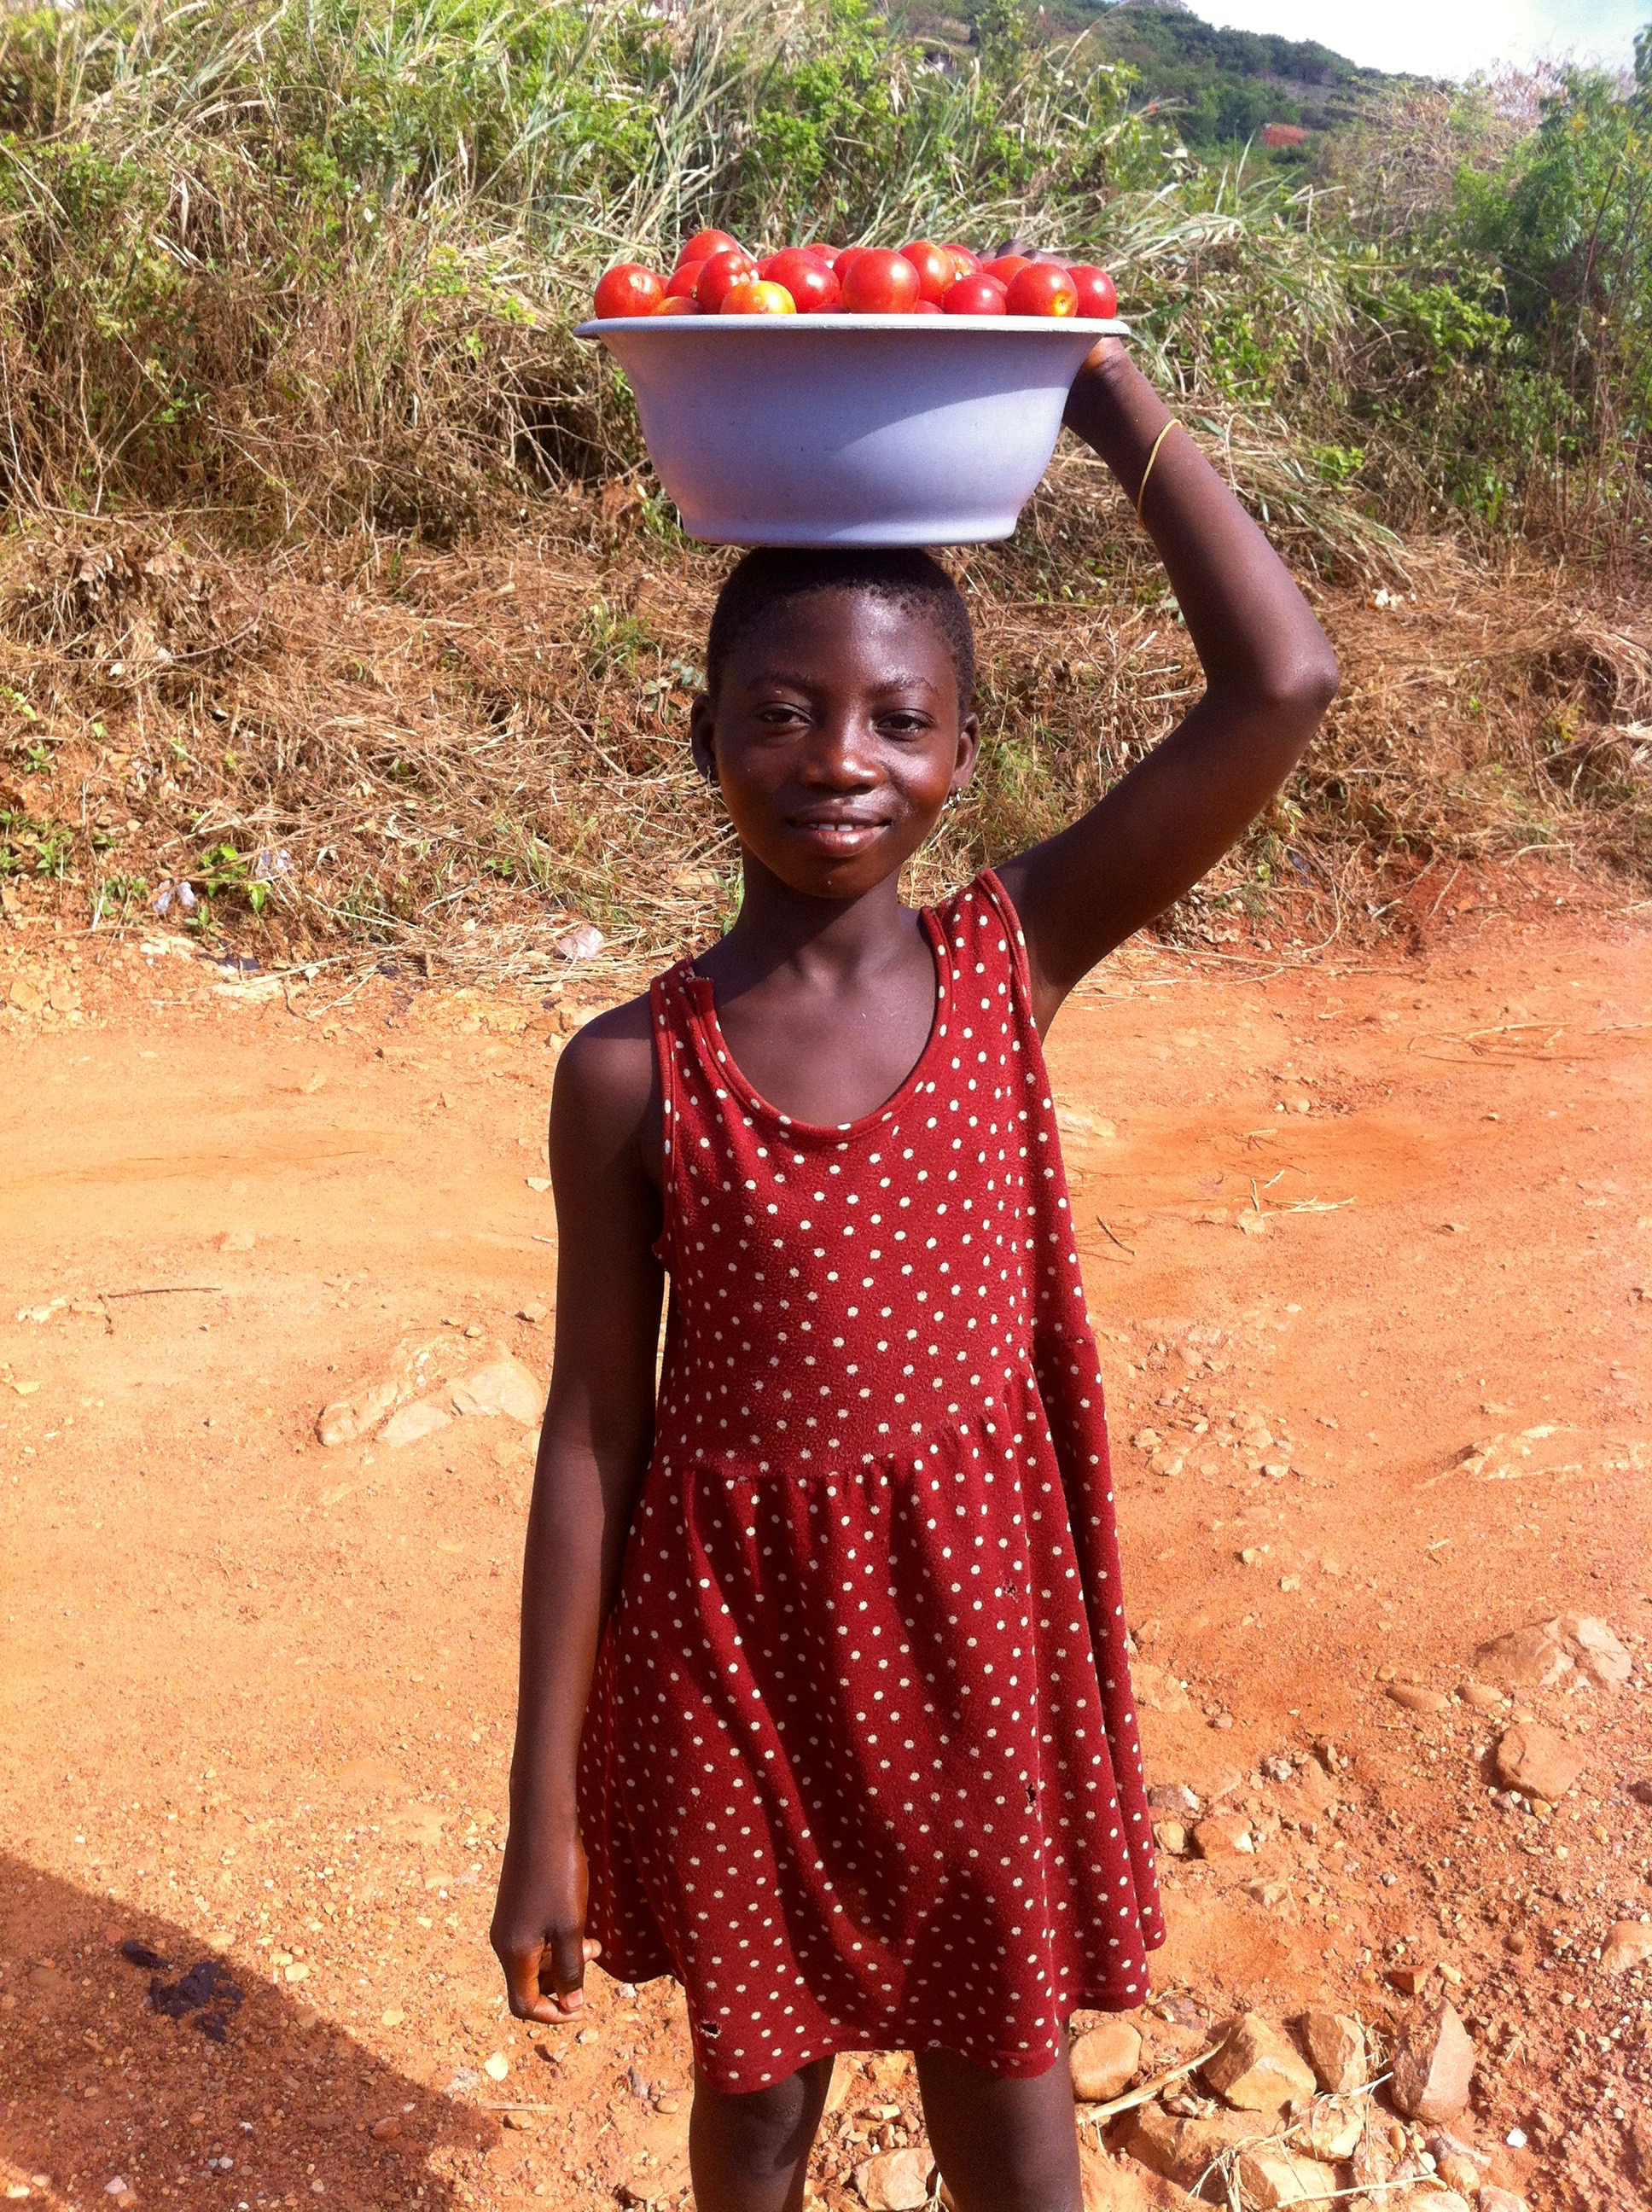 Eunice street hawking tomatoes in Kokrobite, Ghana. #JujuFilms